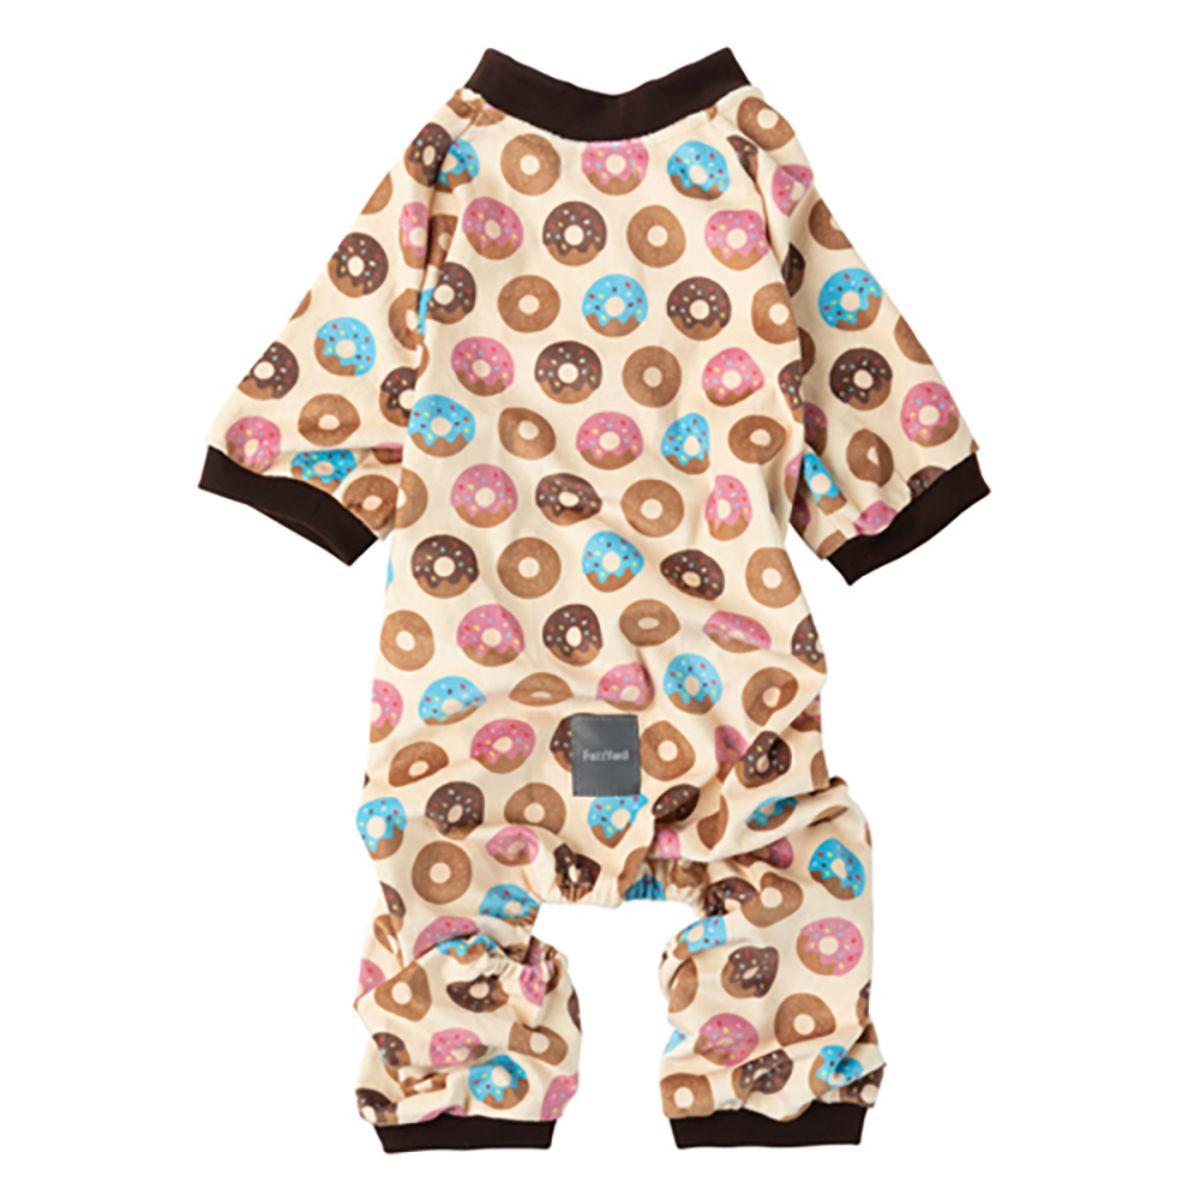 FuzzYard Go Nuts (Donuts) Dog Pajamas